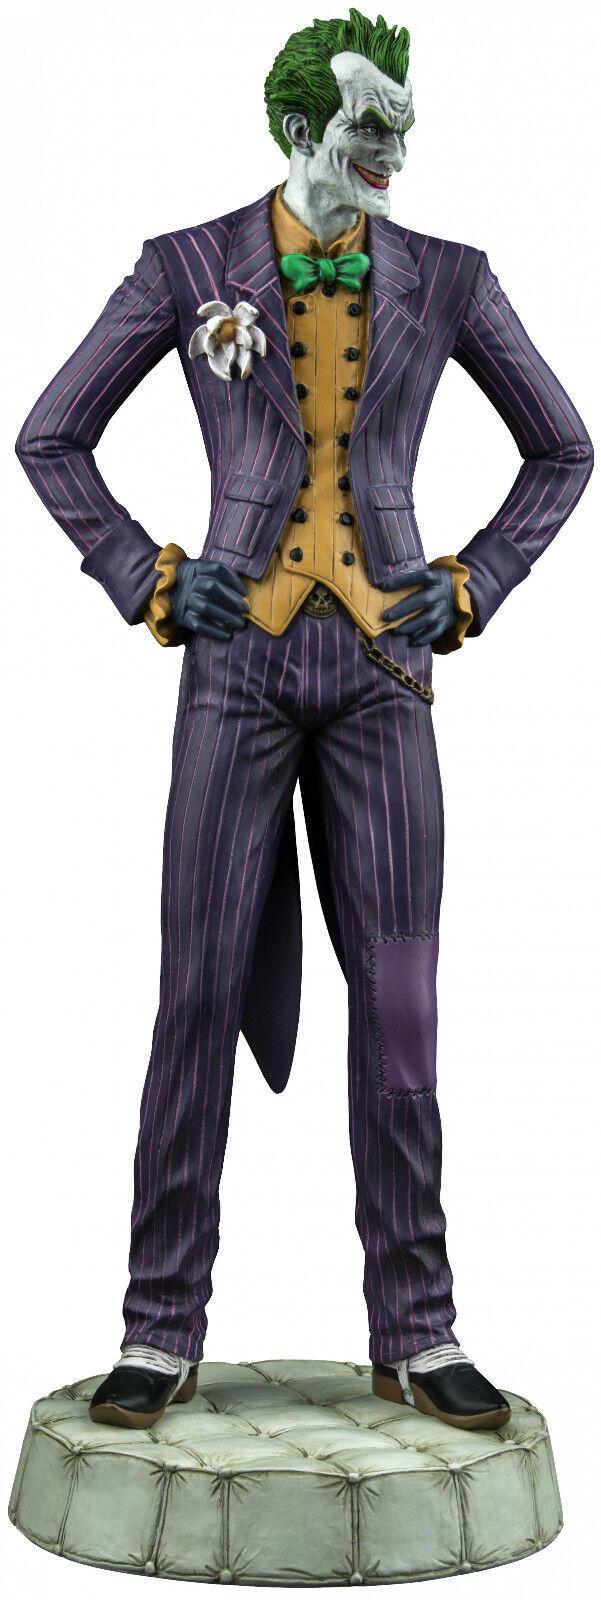 BATMAN  Arkham Asylum - The Joker 1 6th Scale Statue (Ikon Collectables)  NEW